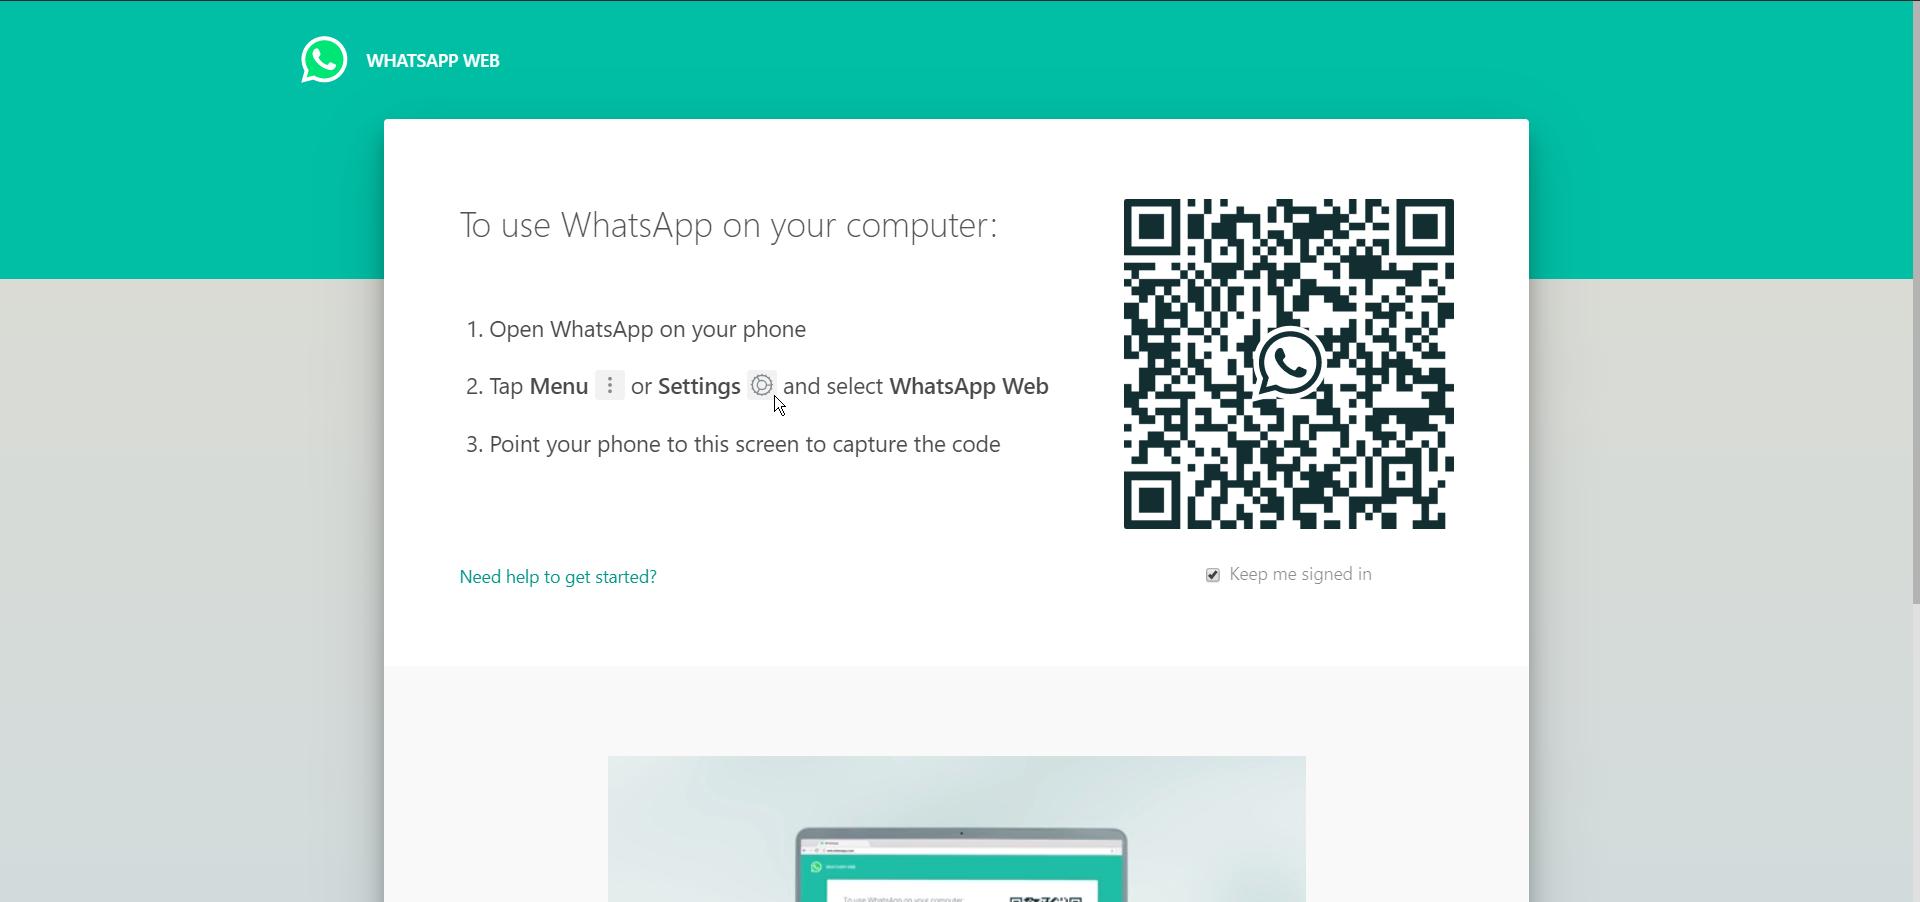 Whatsapp Web Complete Guide On Web Whatsapp Com